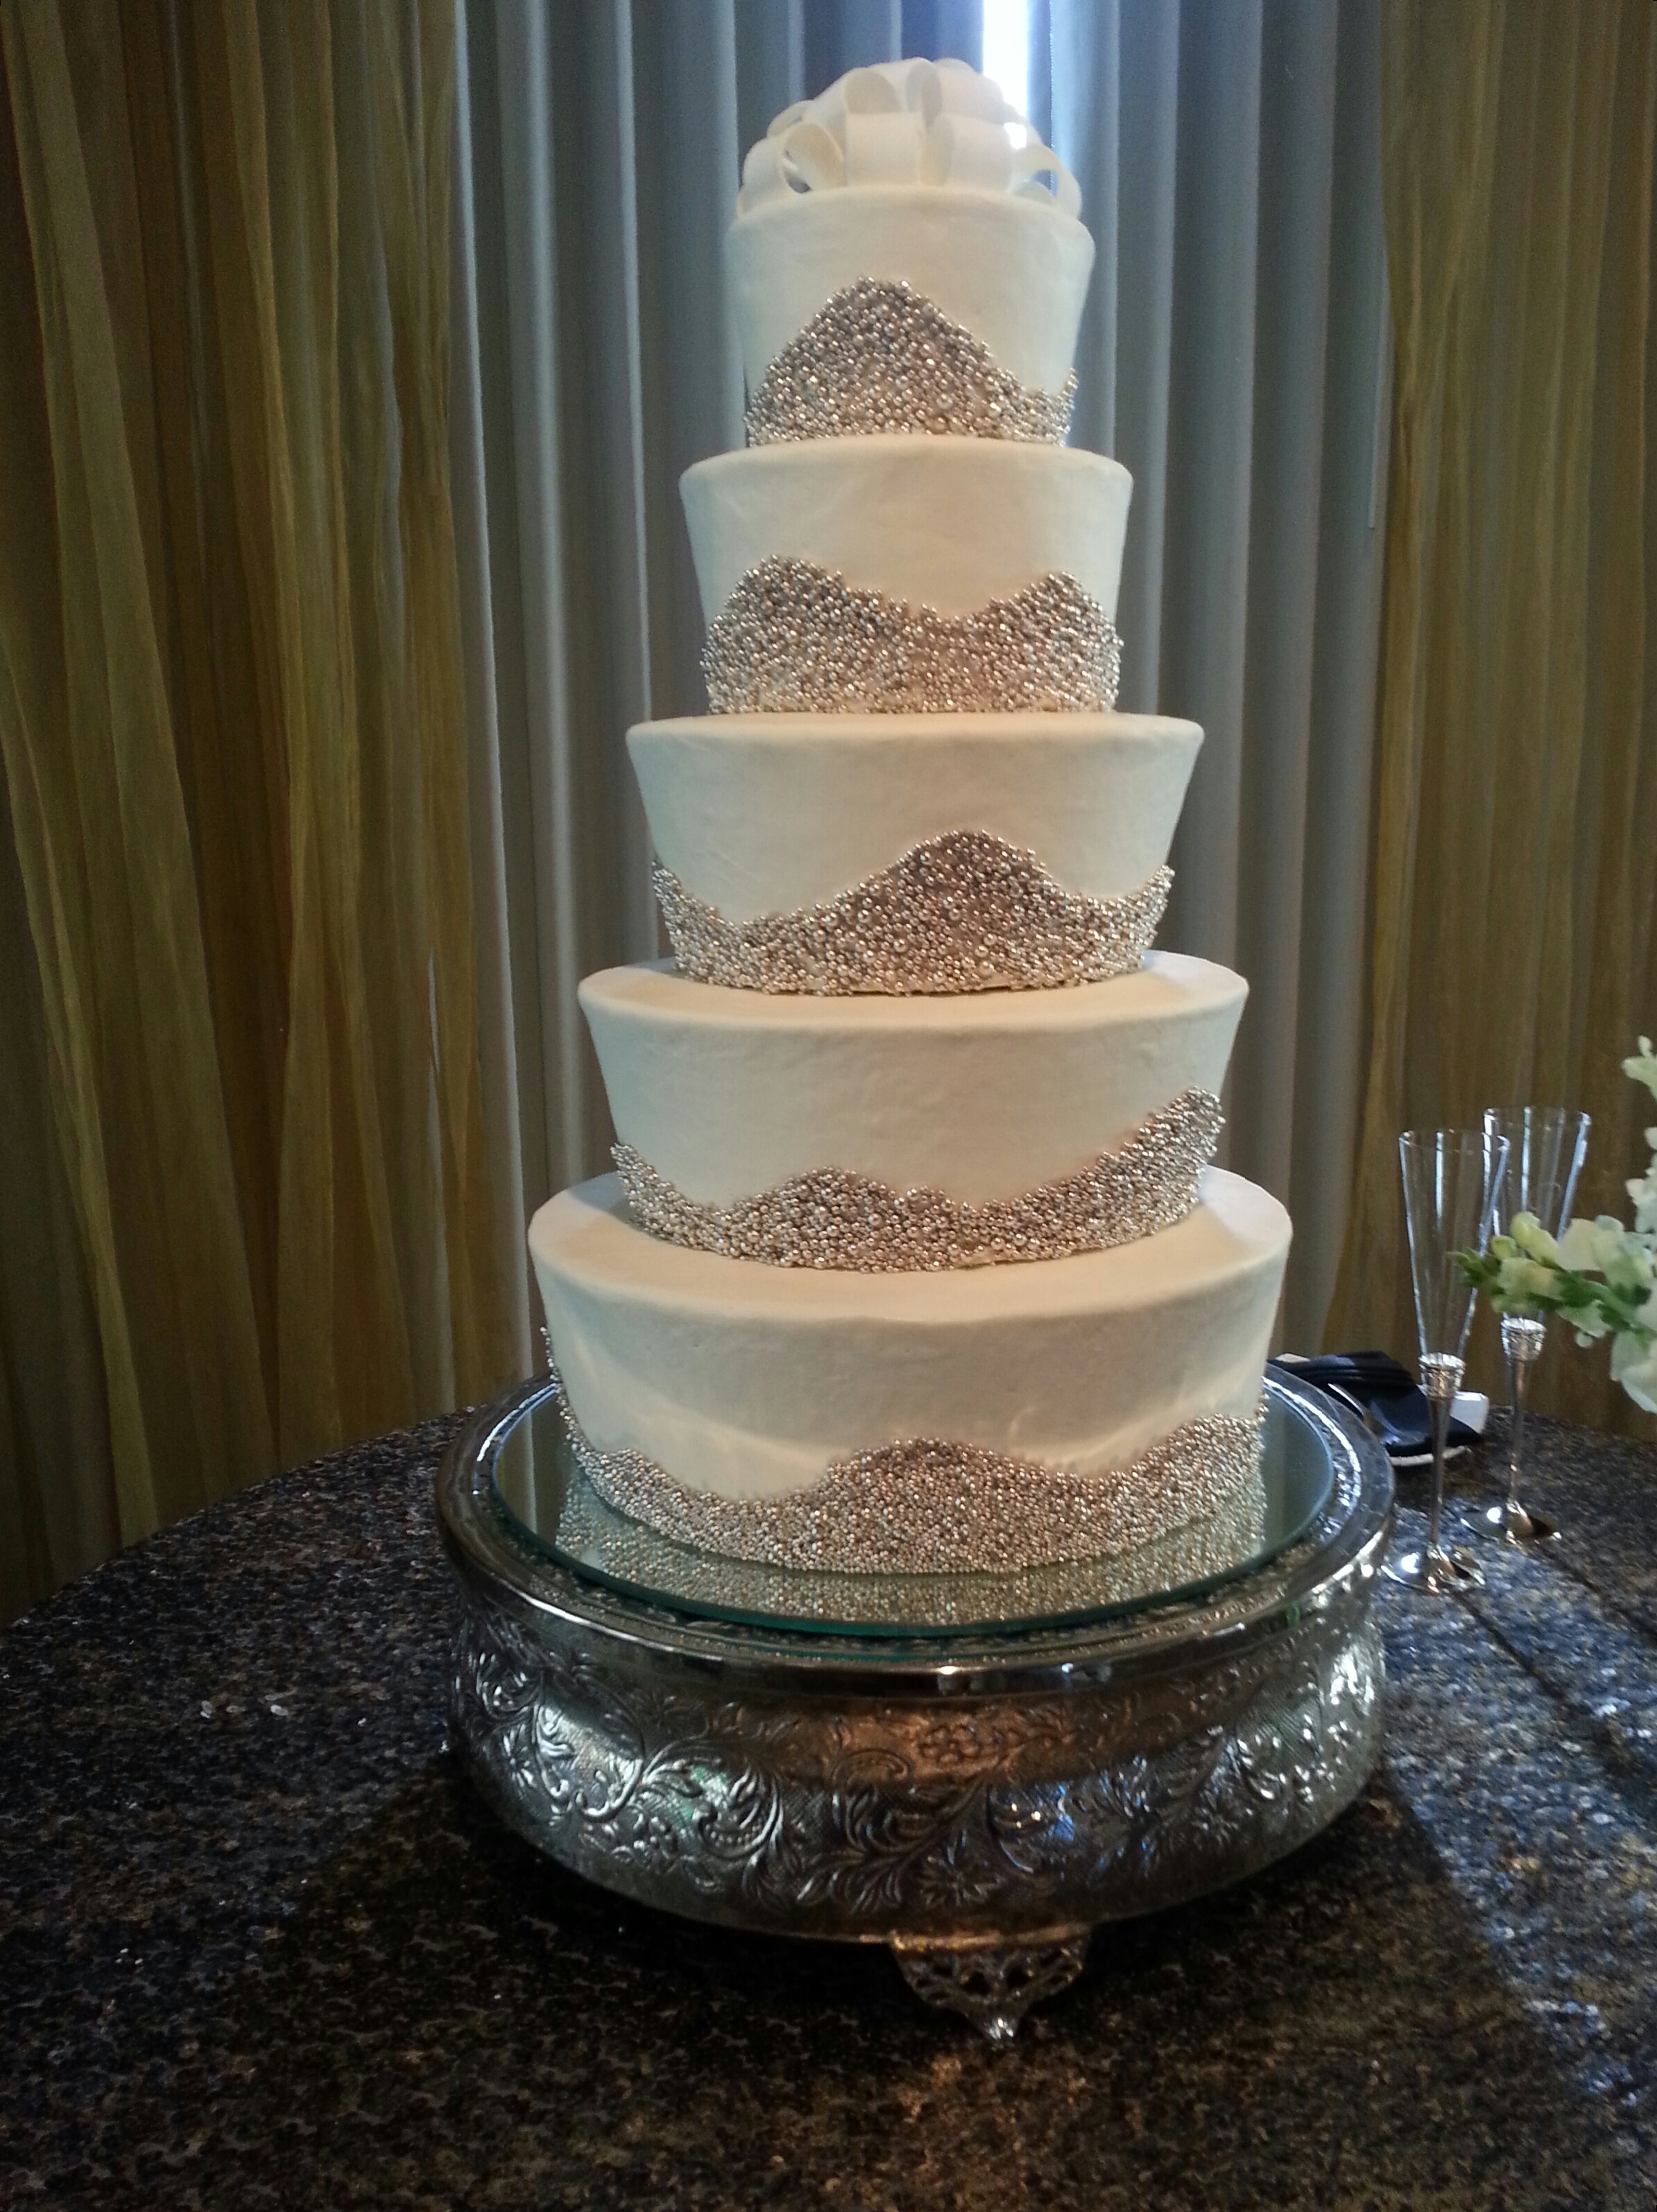 Virginia's Cakes Cafe & Bakery image 2